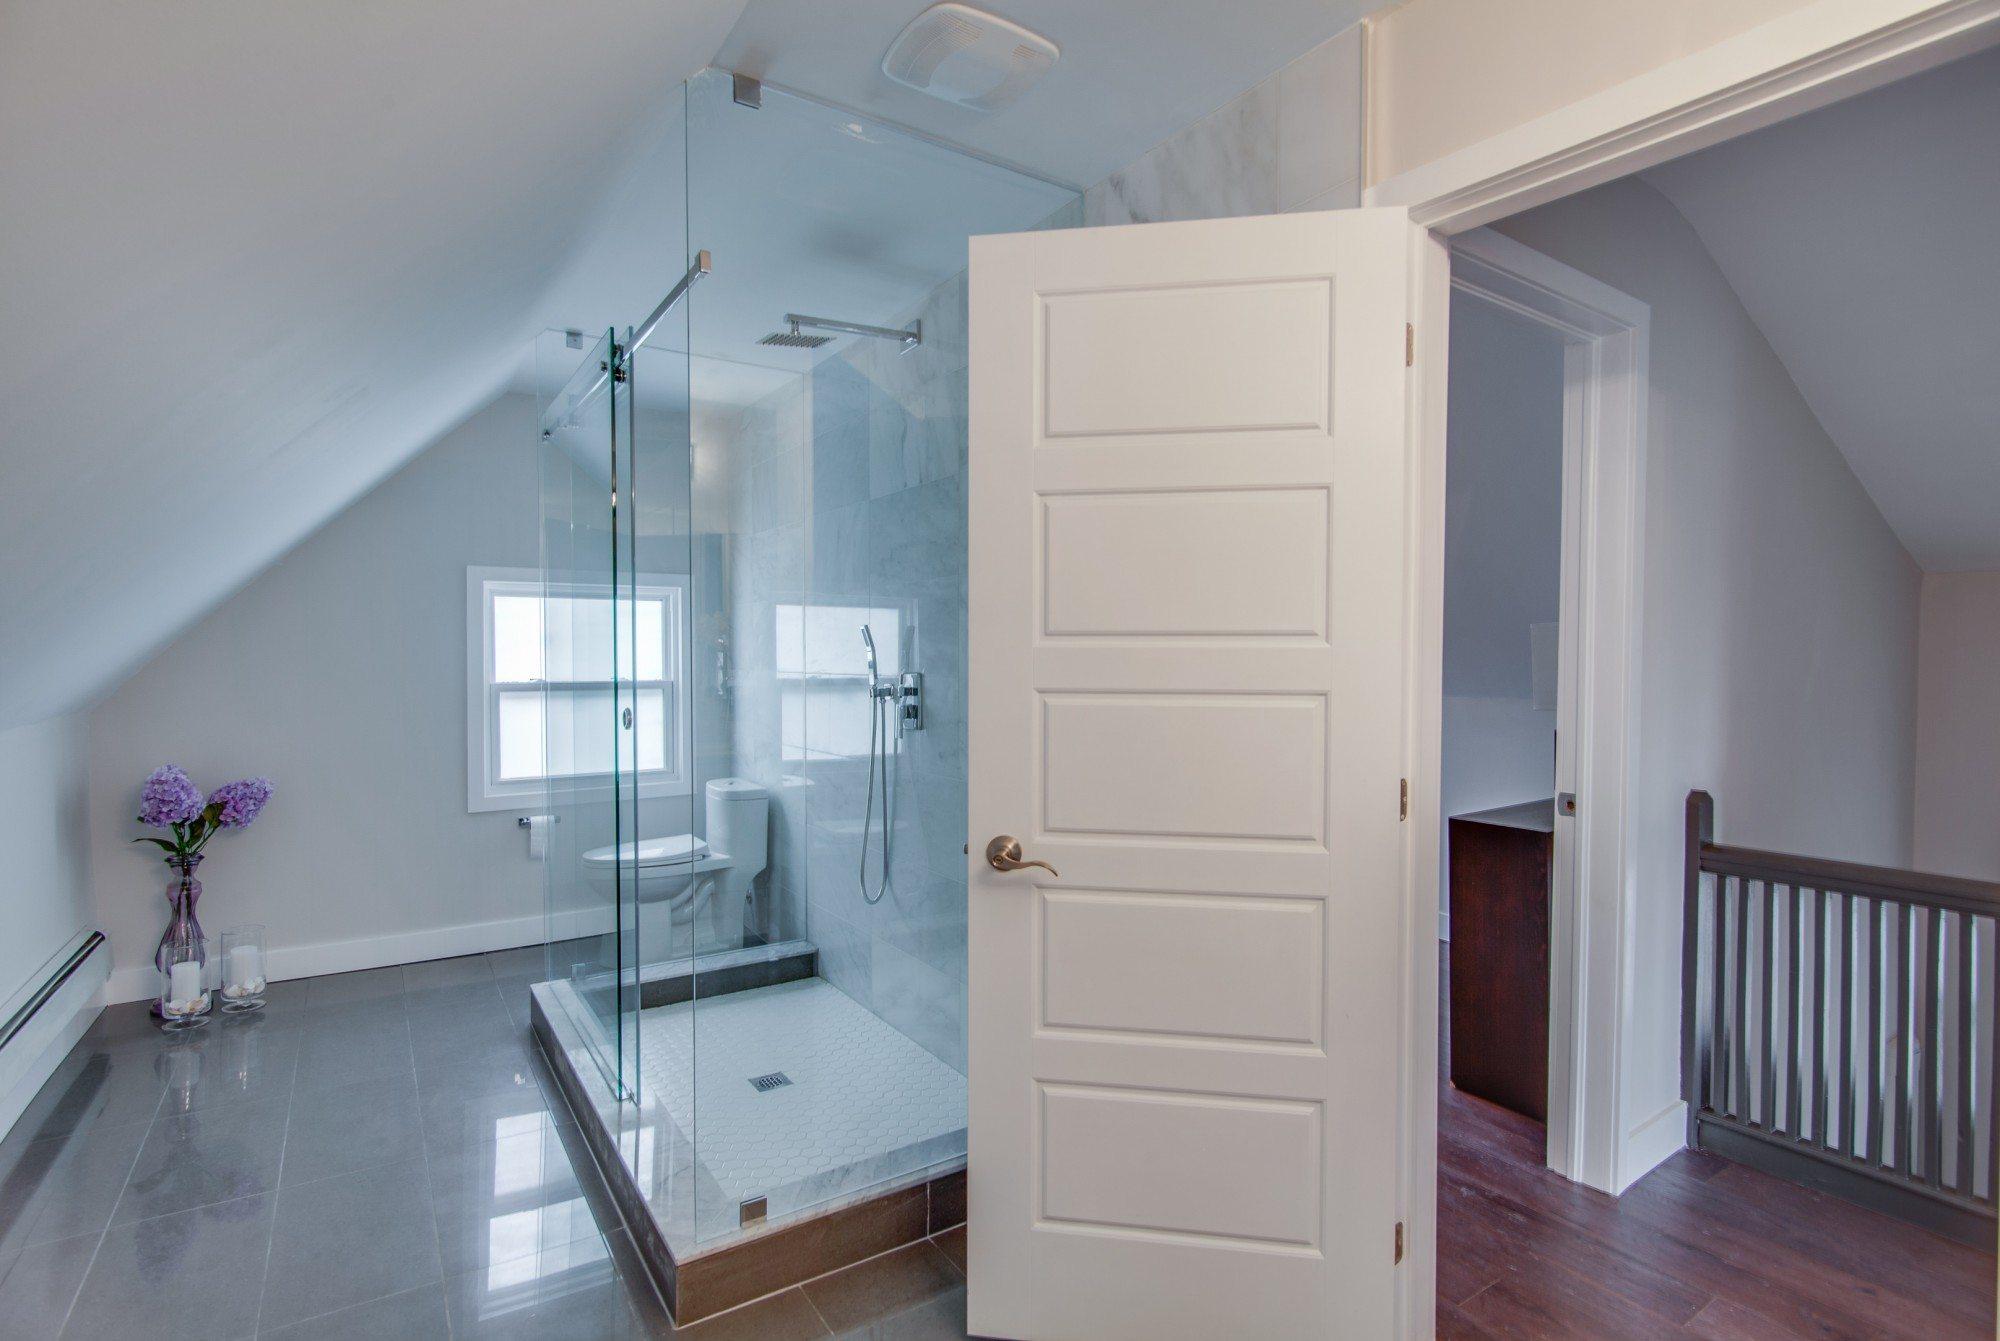 toronto-house-for-sale-309-sunnyside-avenue-14